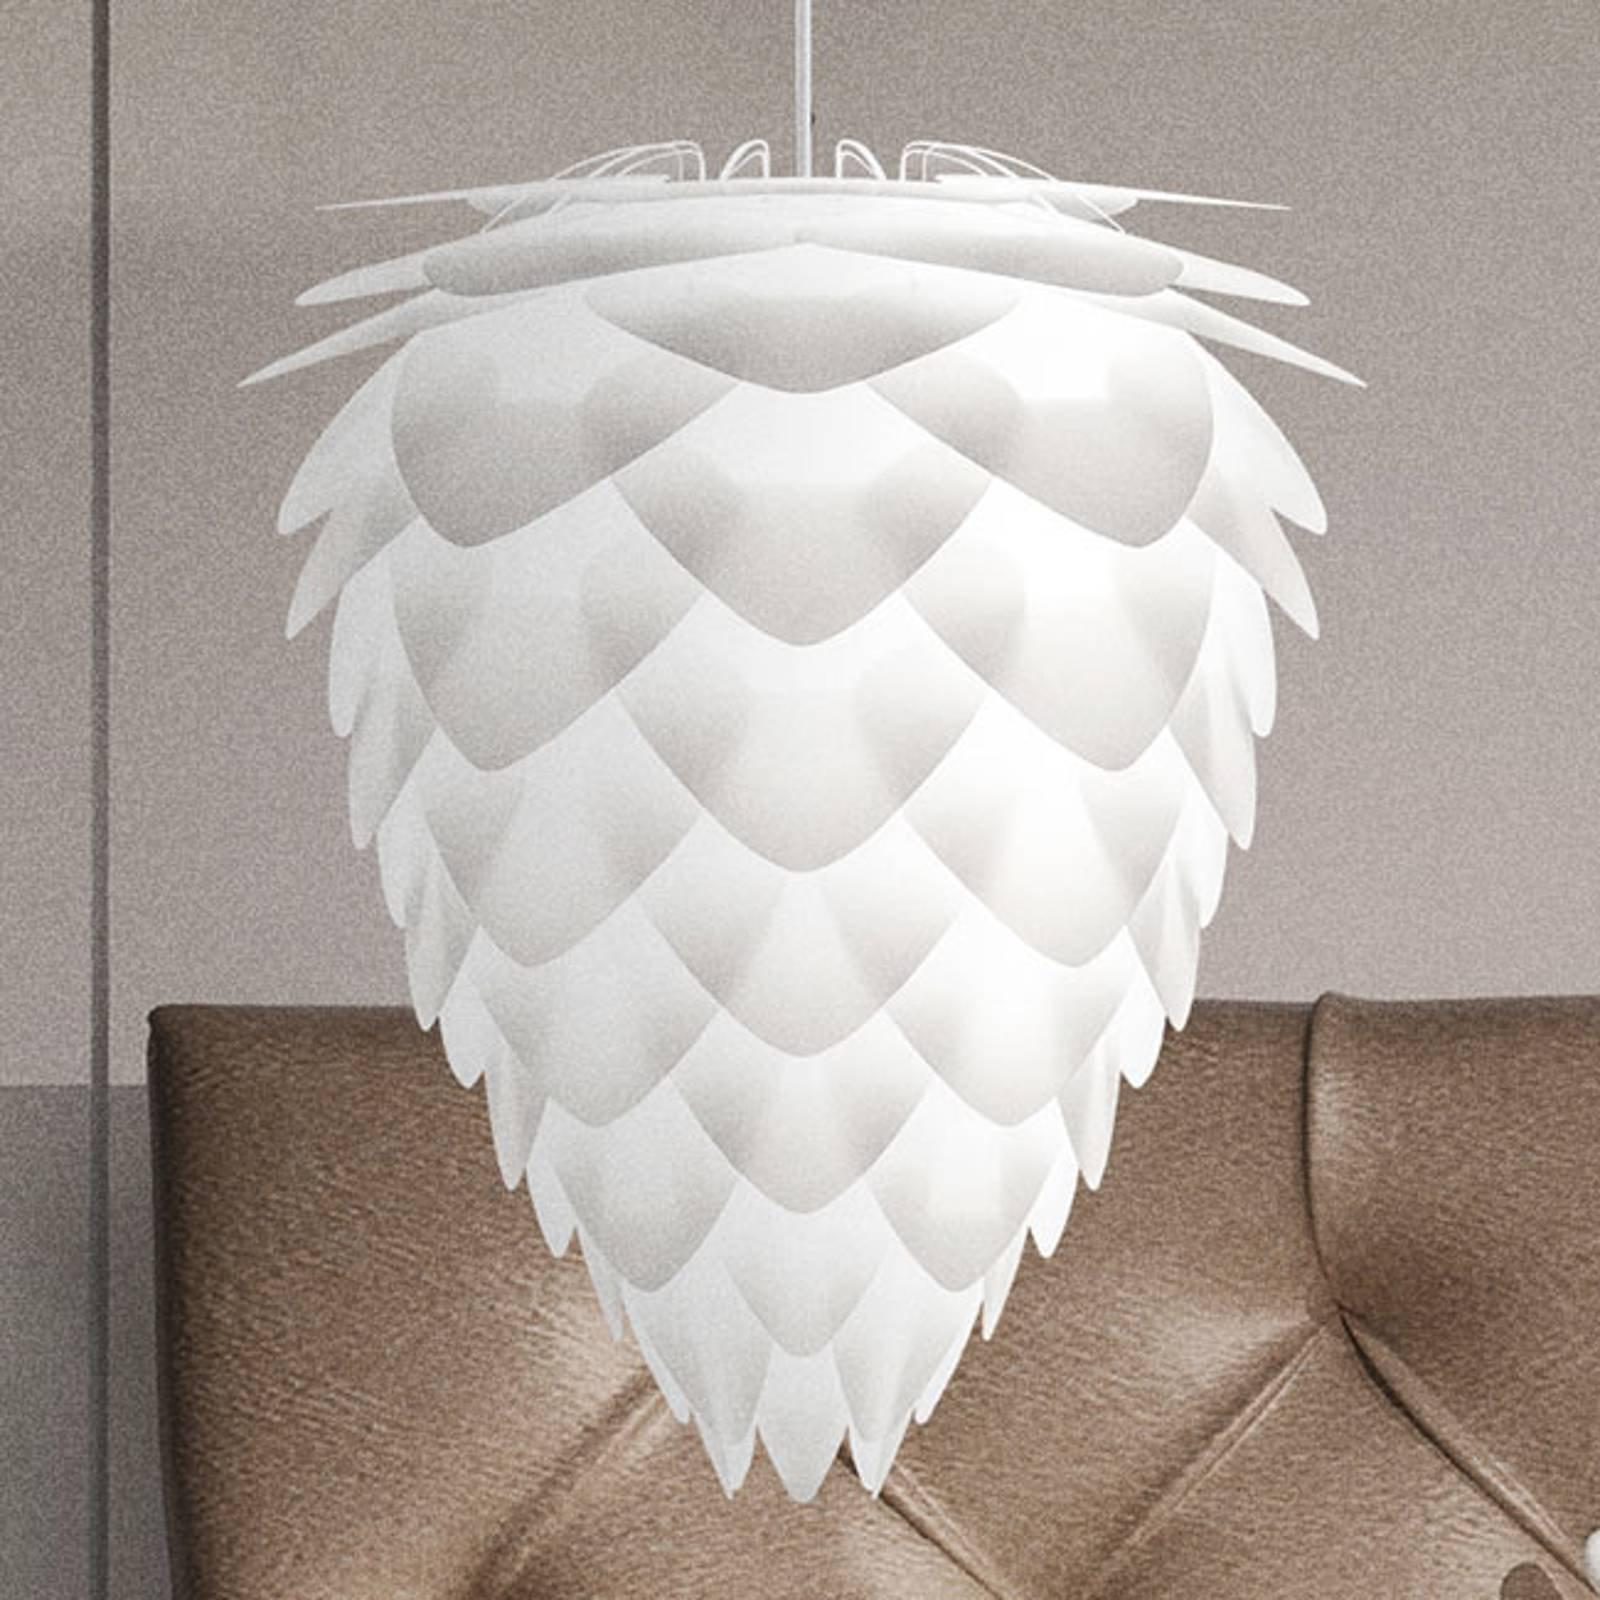 Conia medium - effektfull pendellampe i hvitt